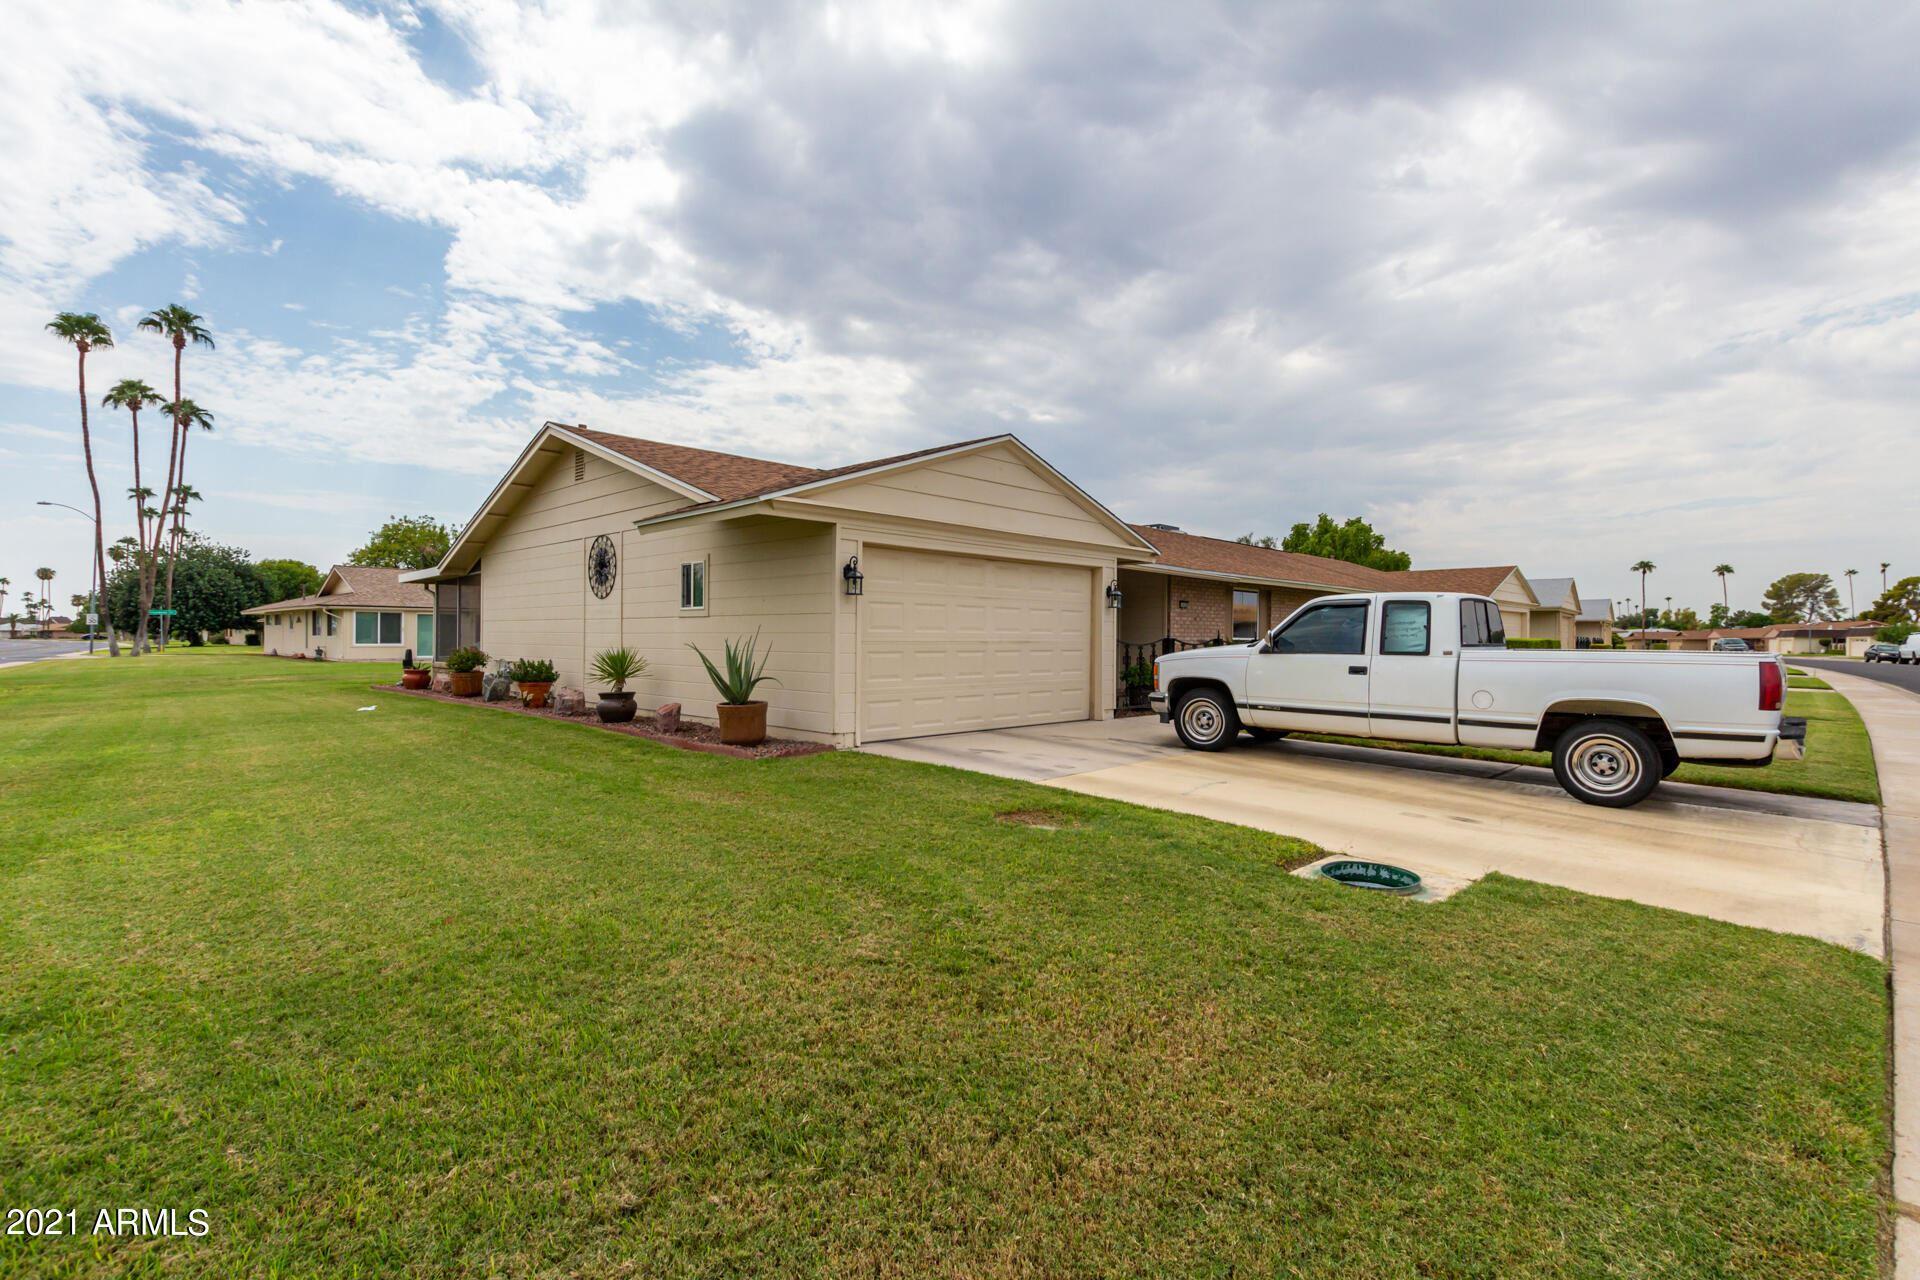 Photo of 10401 W PRAIRIE HILLS Circle, Sun City, AZ 85351 (MLS # 6295521)